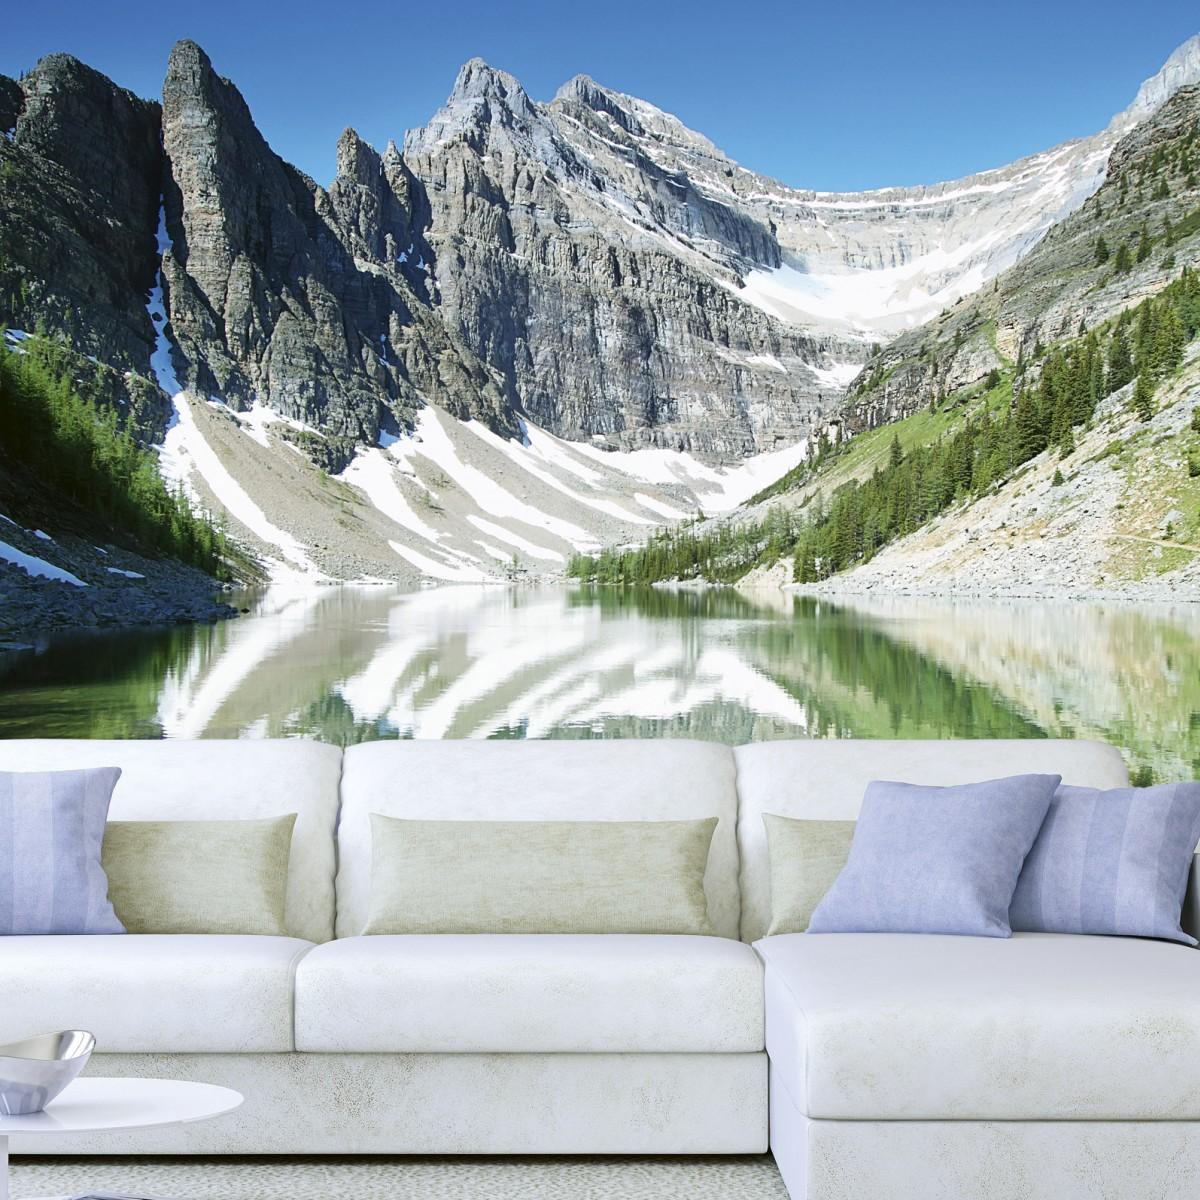 Foto tapet 3D Lake Agnes, Dimex, 5 fâșii, 375 x 250cm